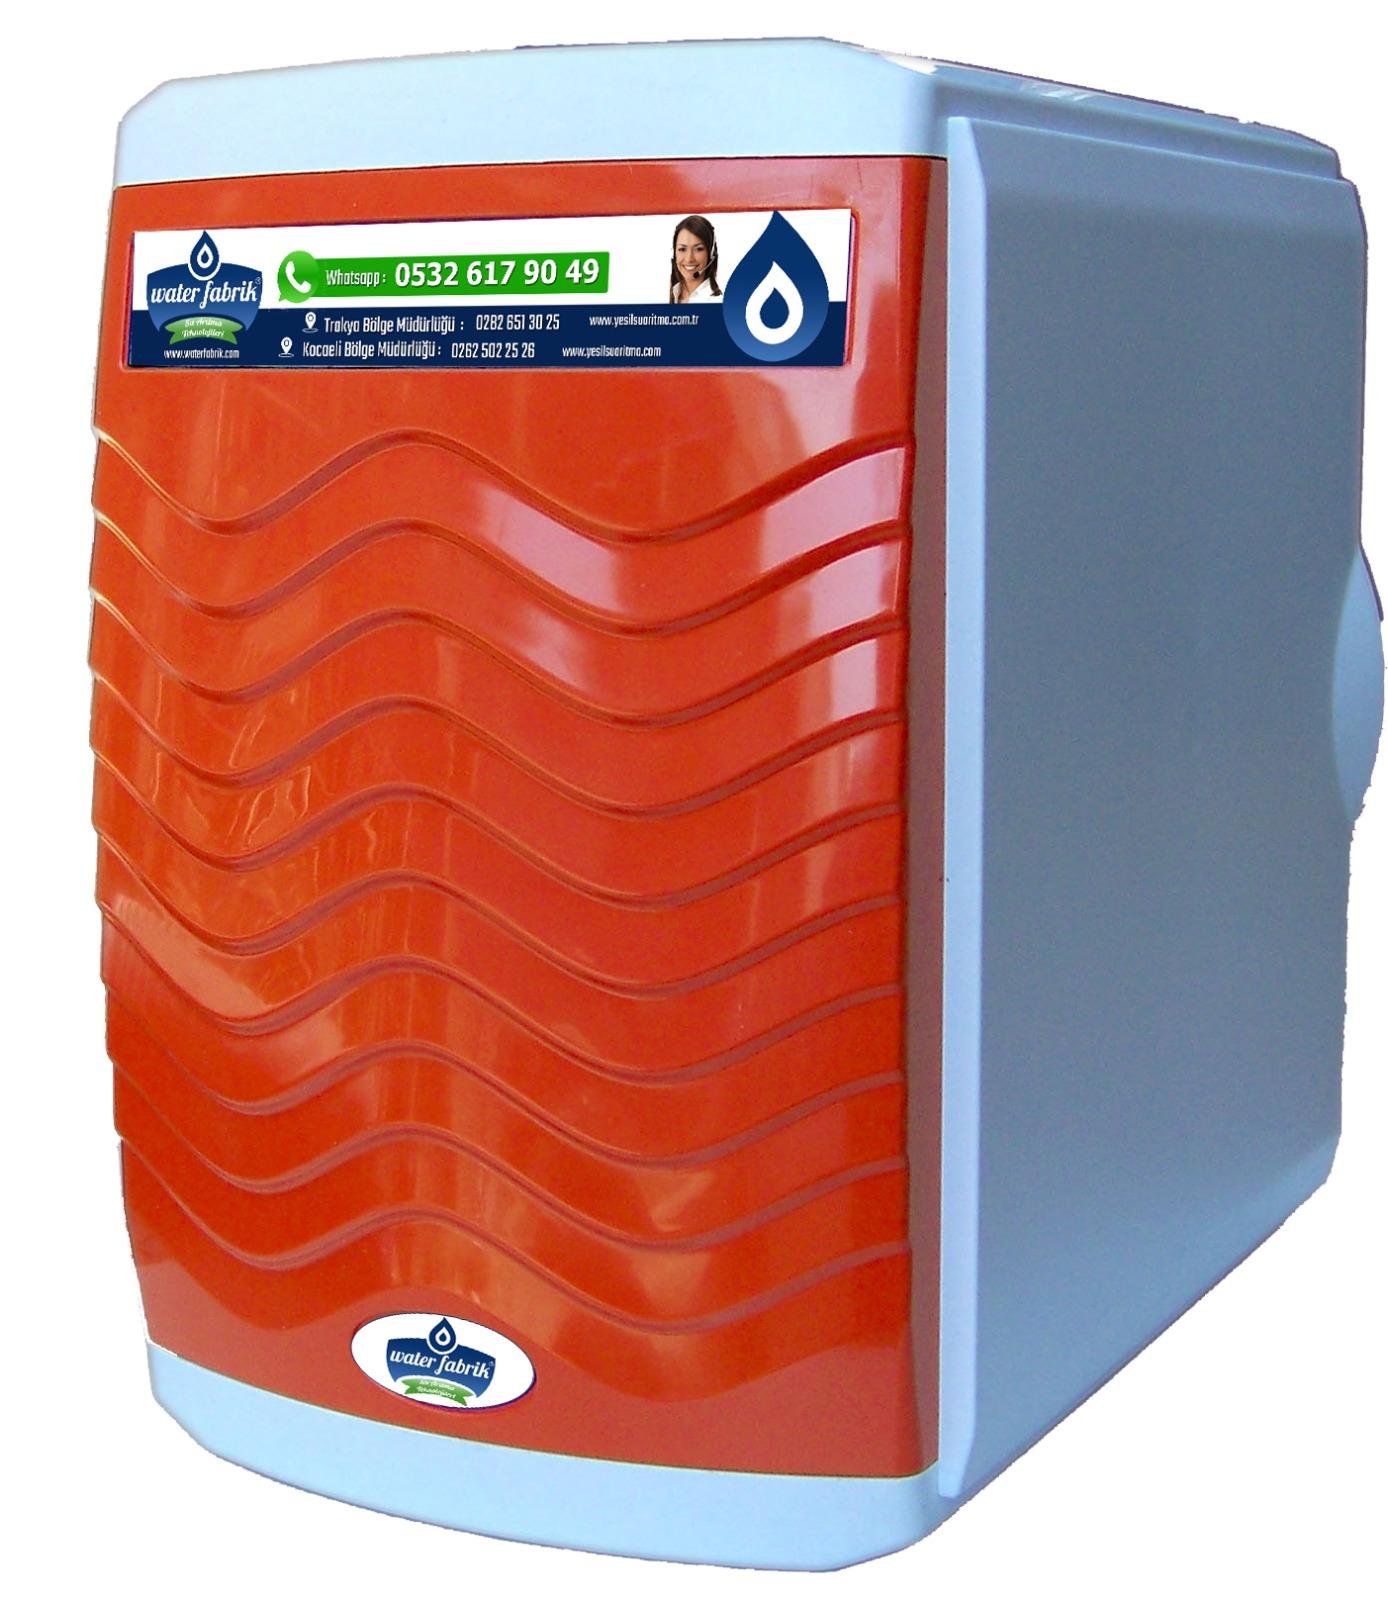 çerkezköy su arıtma, su arıtma çerkezköy, su arıtıcıçerkezköy, ev için su arıtma cihazi, en kaliteli su aritma